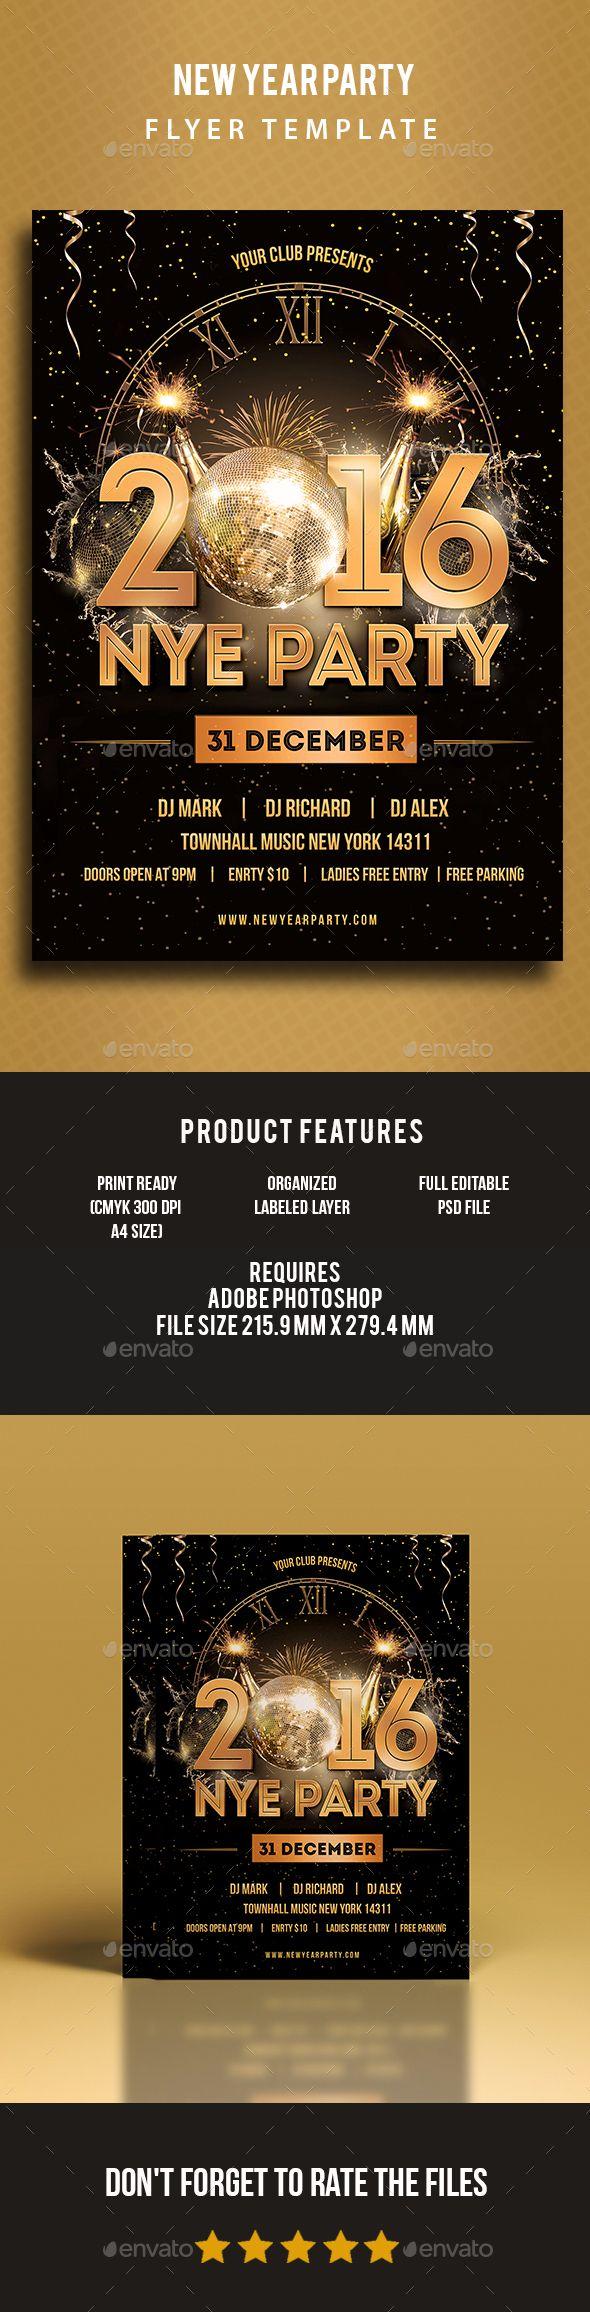 Party Flyer Print Design Design Web Flyer